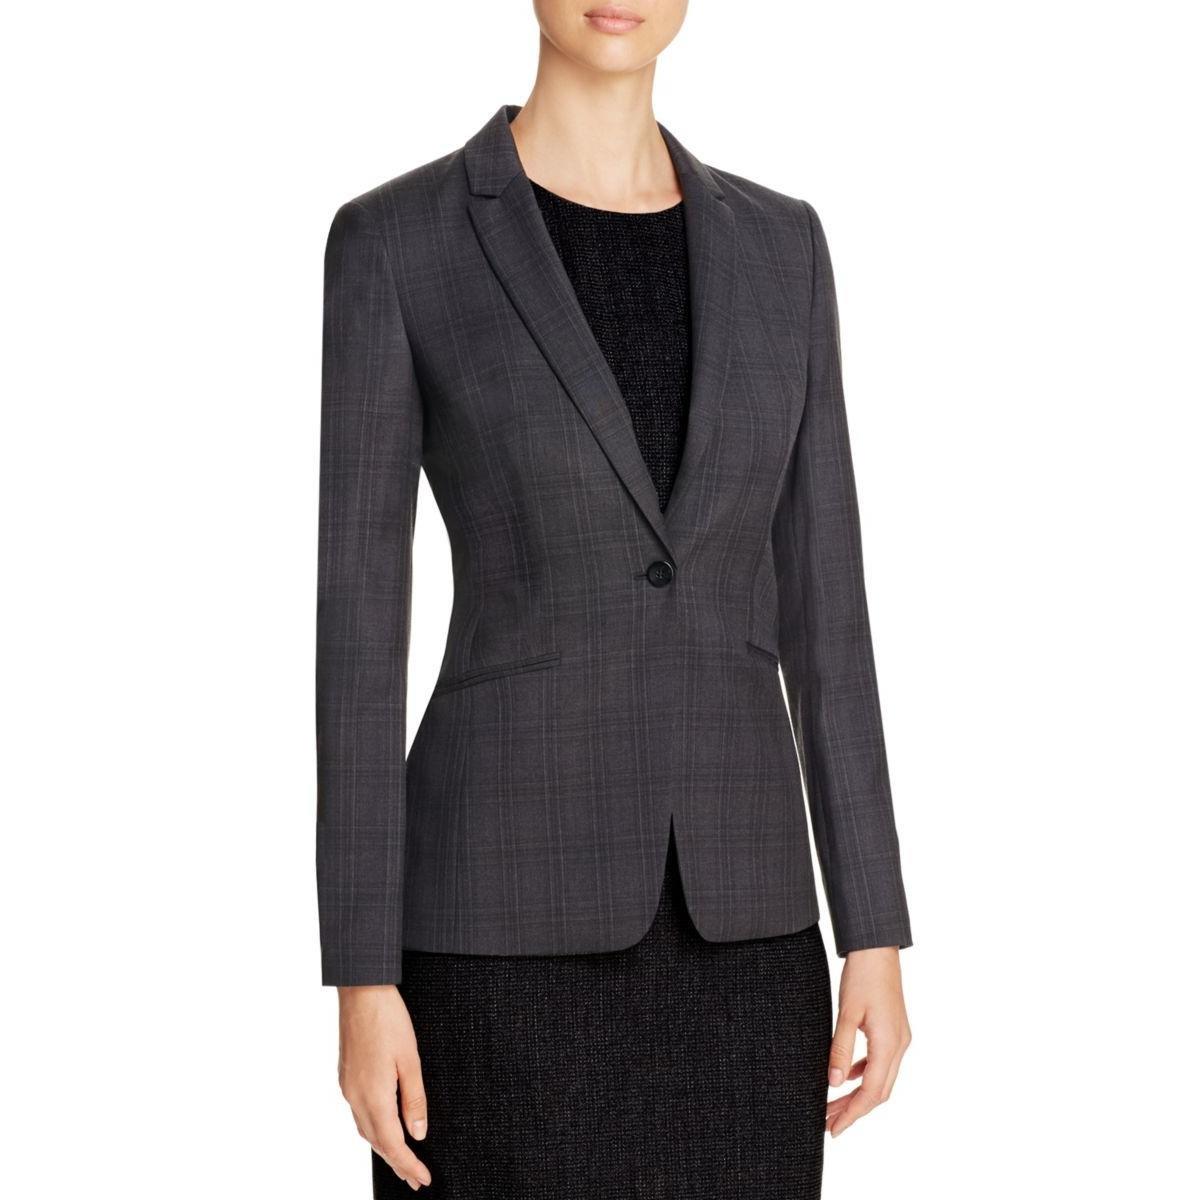 BOSS Hugo Boss Womens Jabina2 Window Pane Long Sleeves One-Button Blazer Gray 10